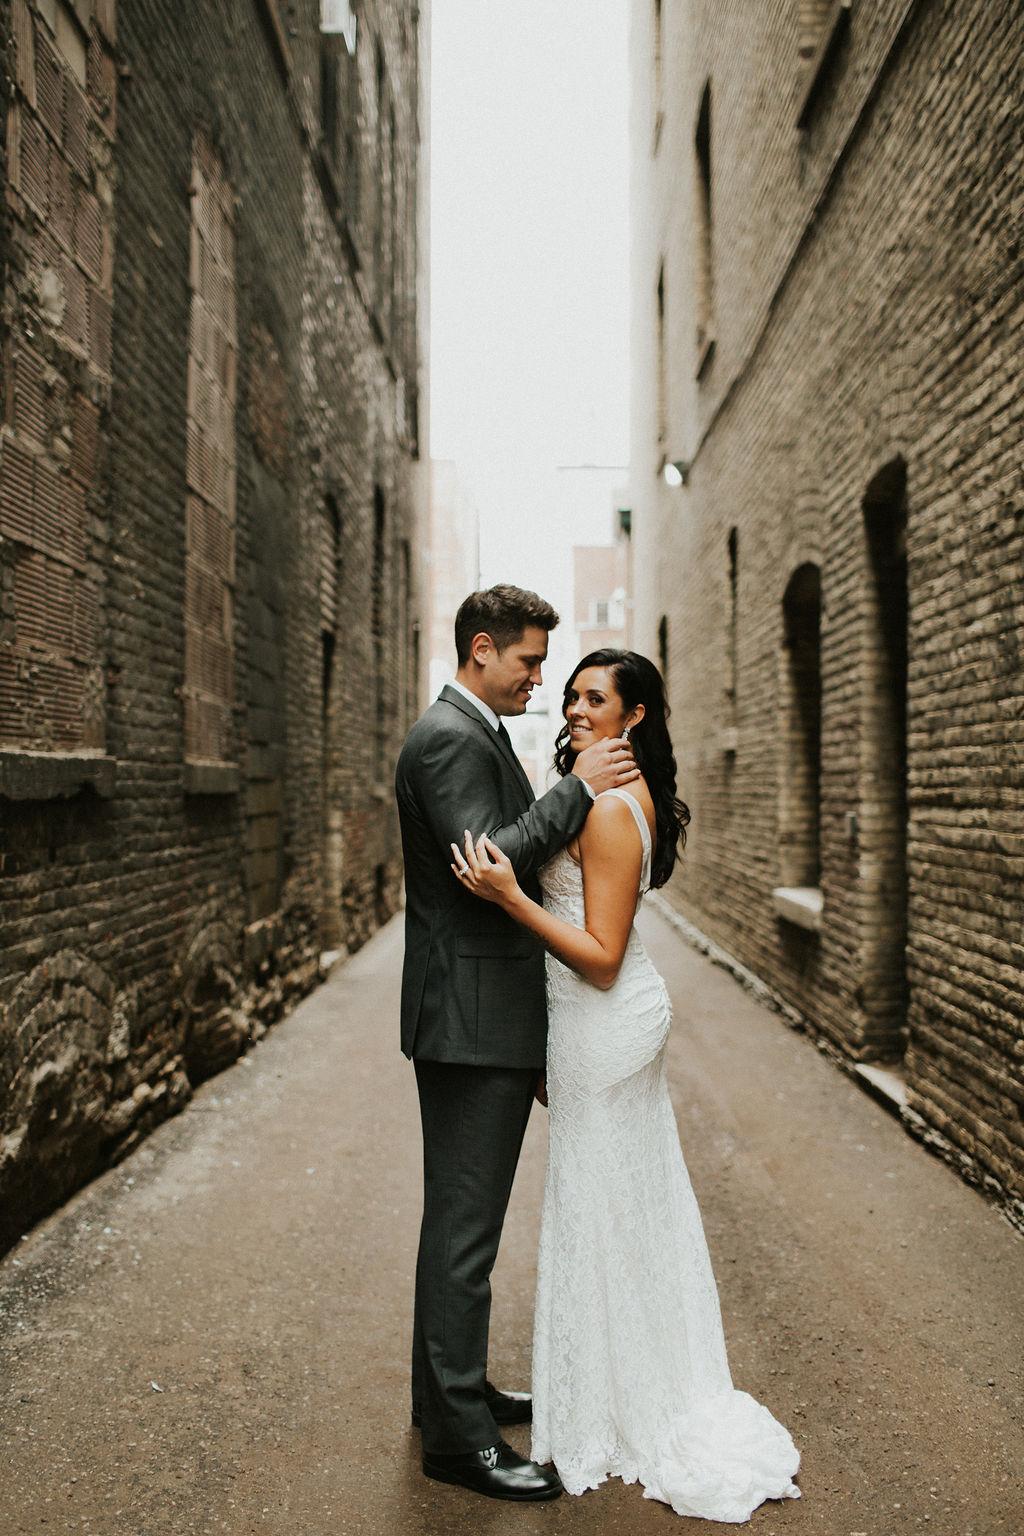 Turgeon+Wedding-208.jpg